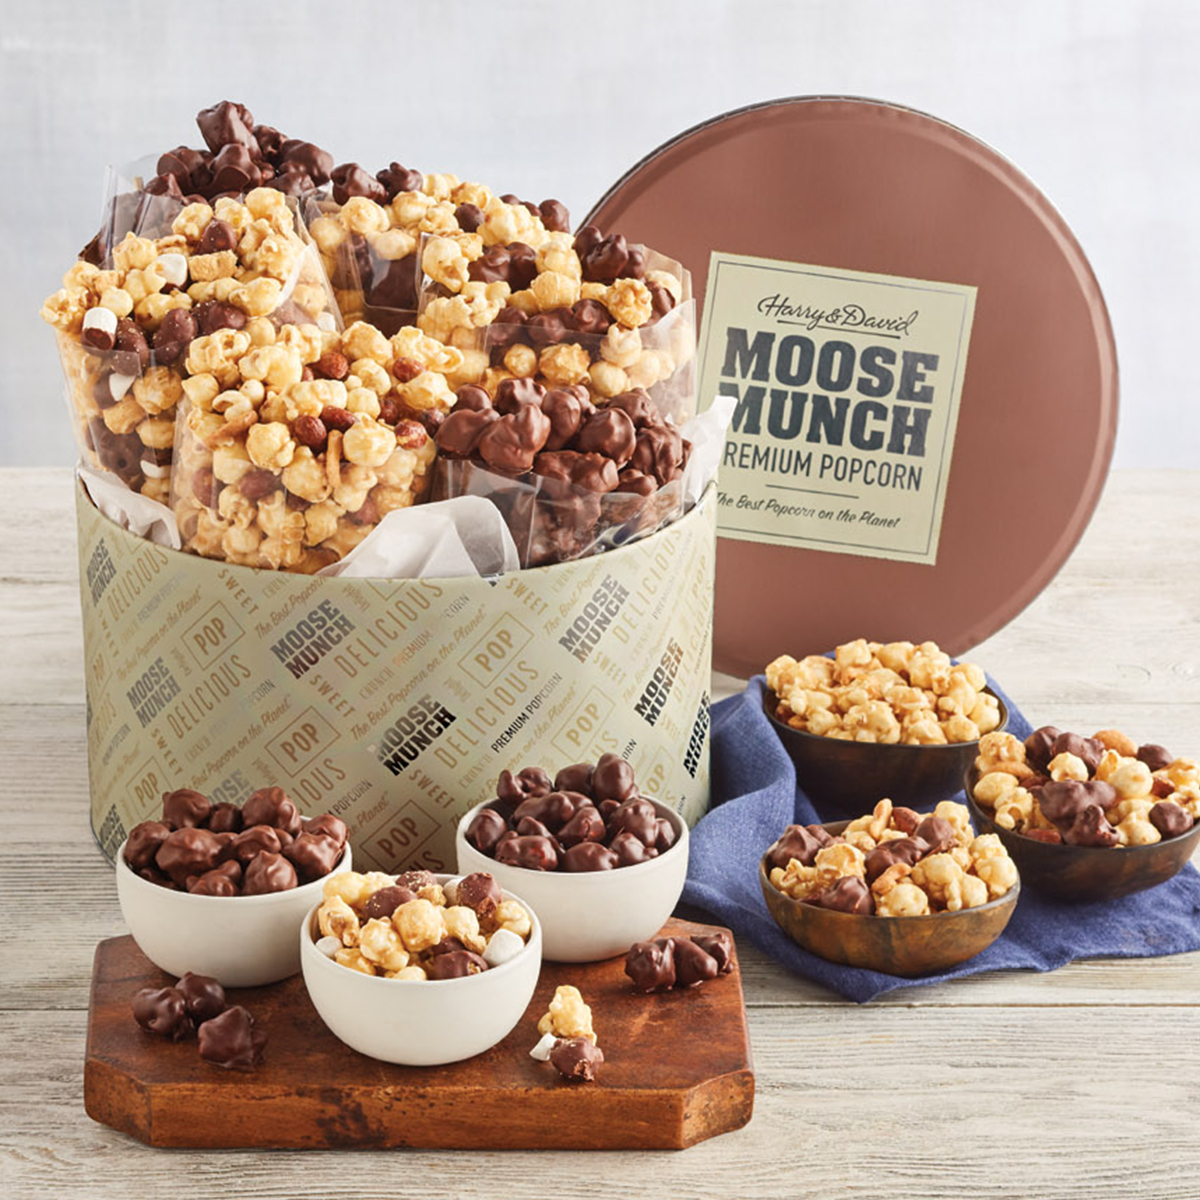 last minute gift idea of moose munch popcorn